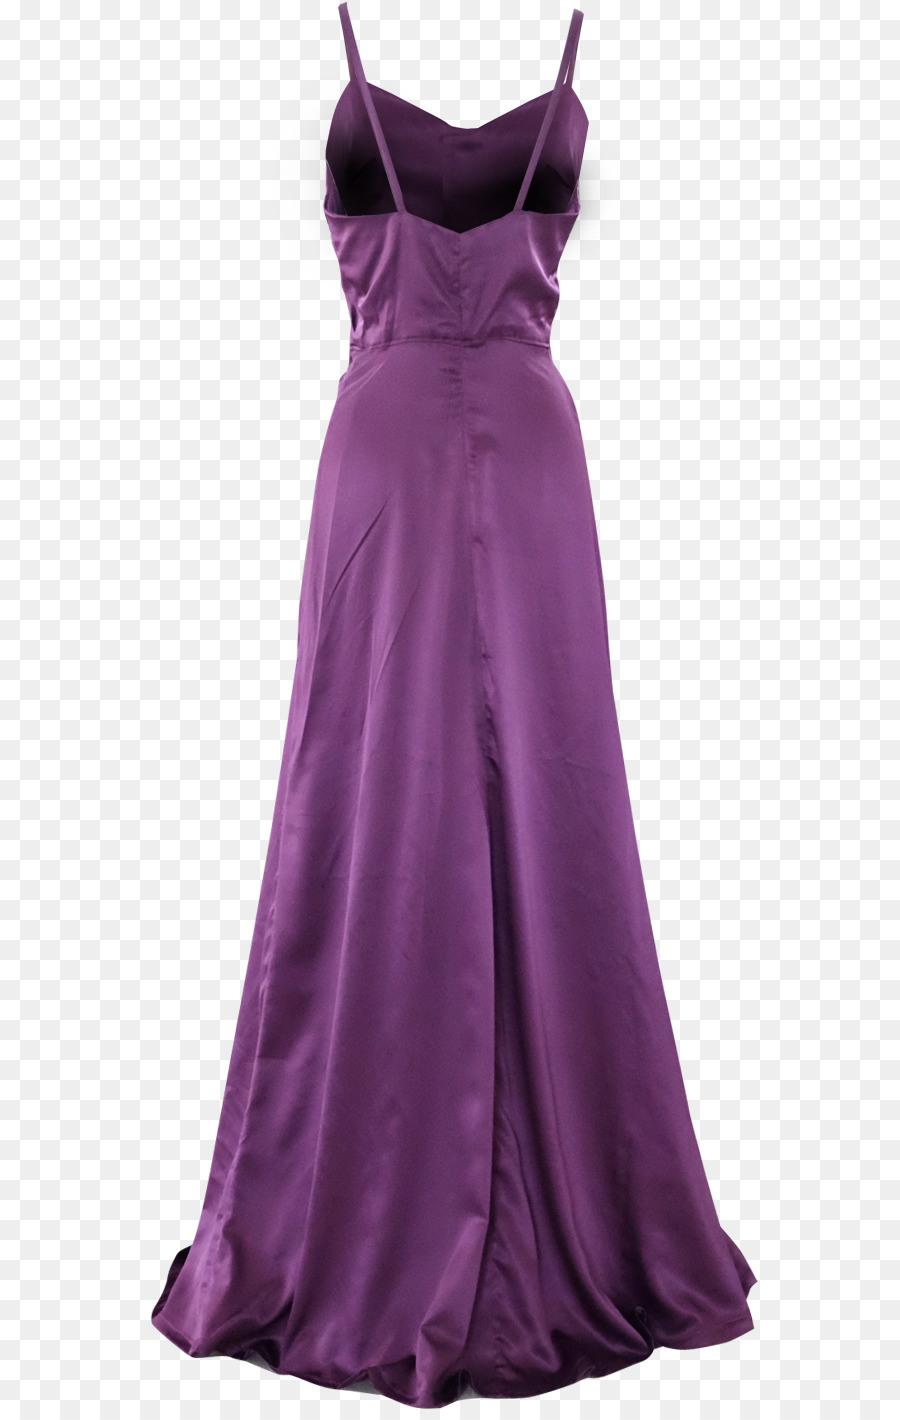 15 Elegant Satin Abendkleid VertriebDesigner Genial Satin Abendkleid Vertrieb